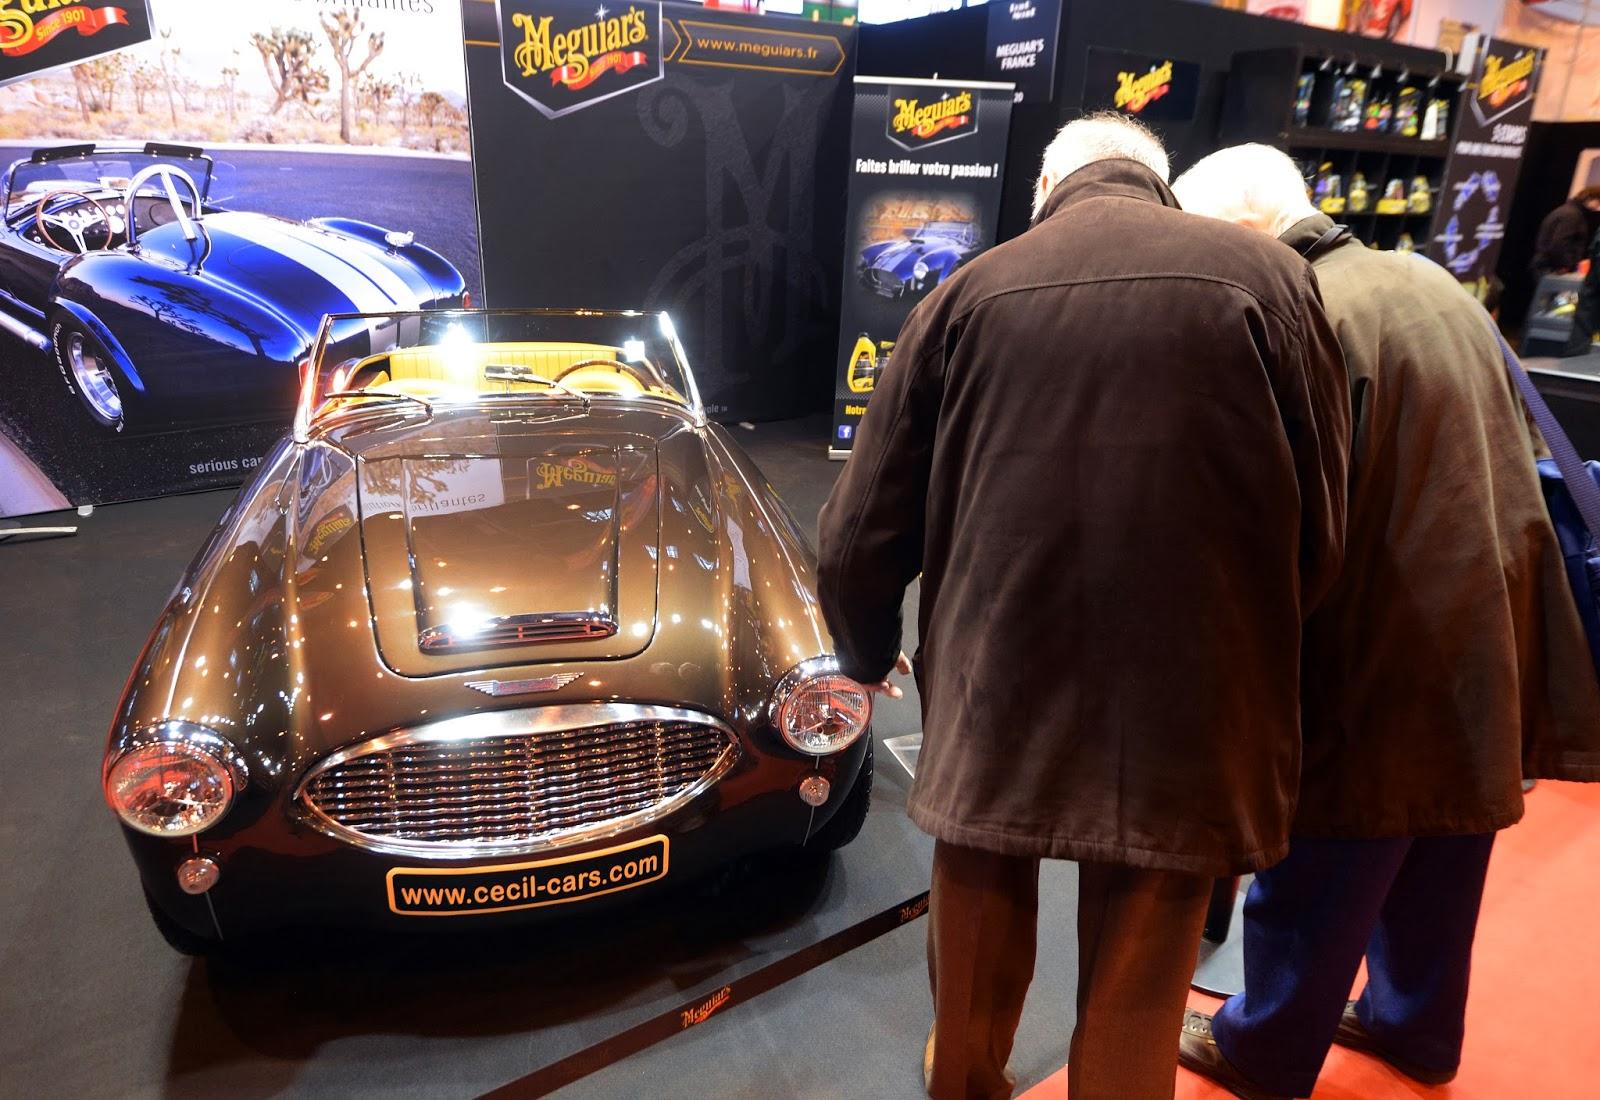 Retromobile, Car Expo, Festival, Exhibition, Portes de Versailles, Paris, Model, Old, Business, Economy, Visitor, Skoda Popular, Mercedes, Citroen 2CV, Meguiar, Auto Industry, Auto,